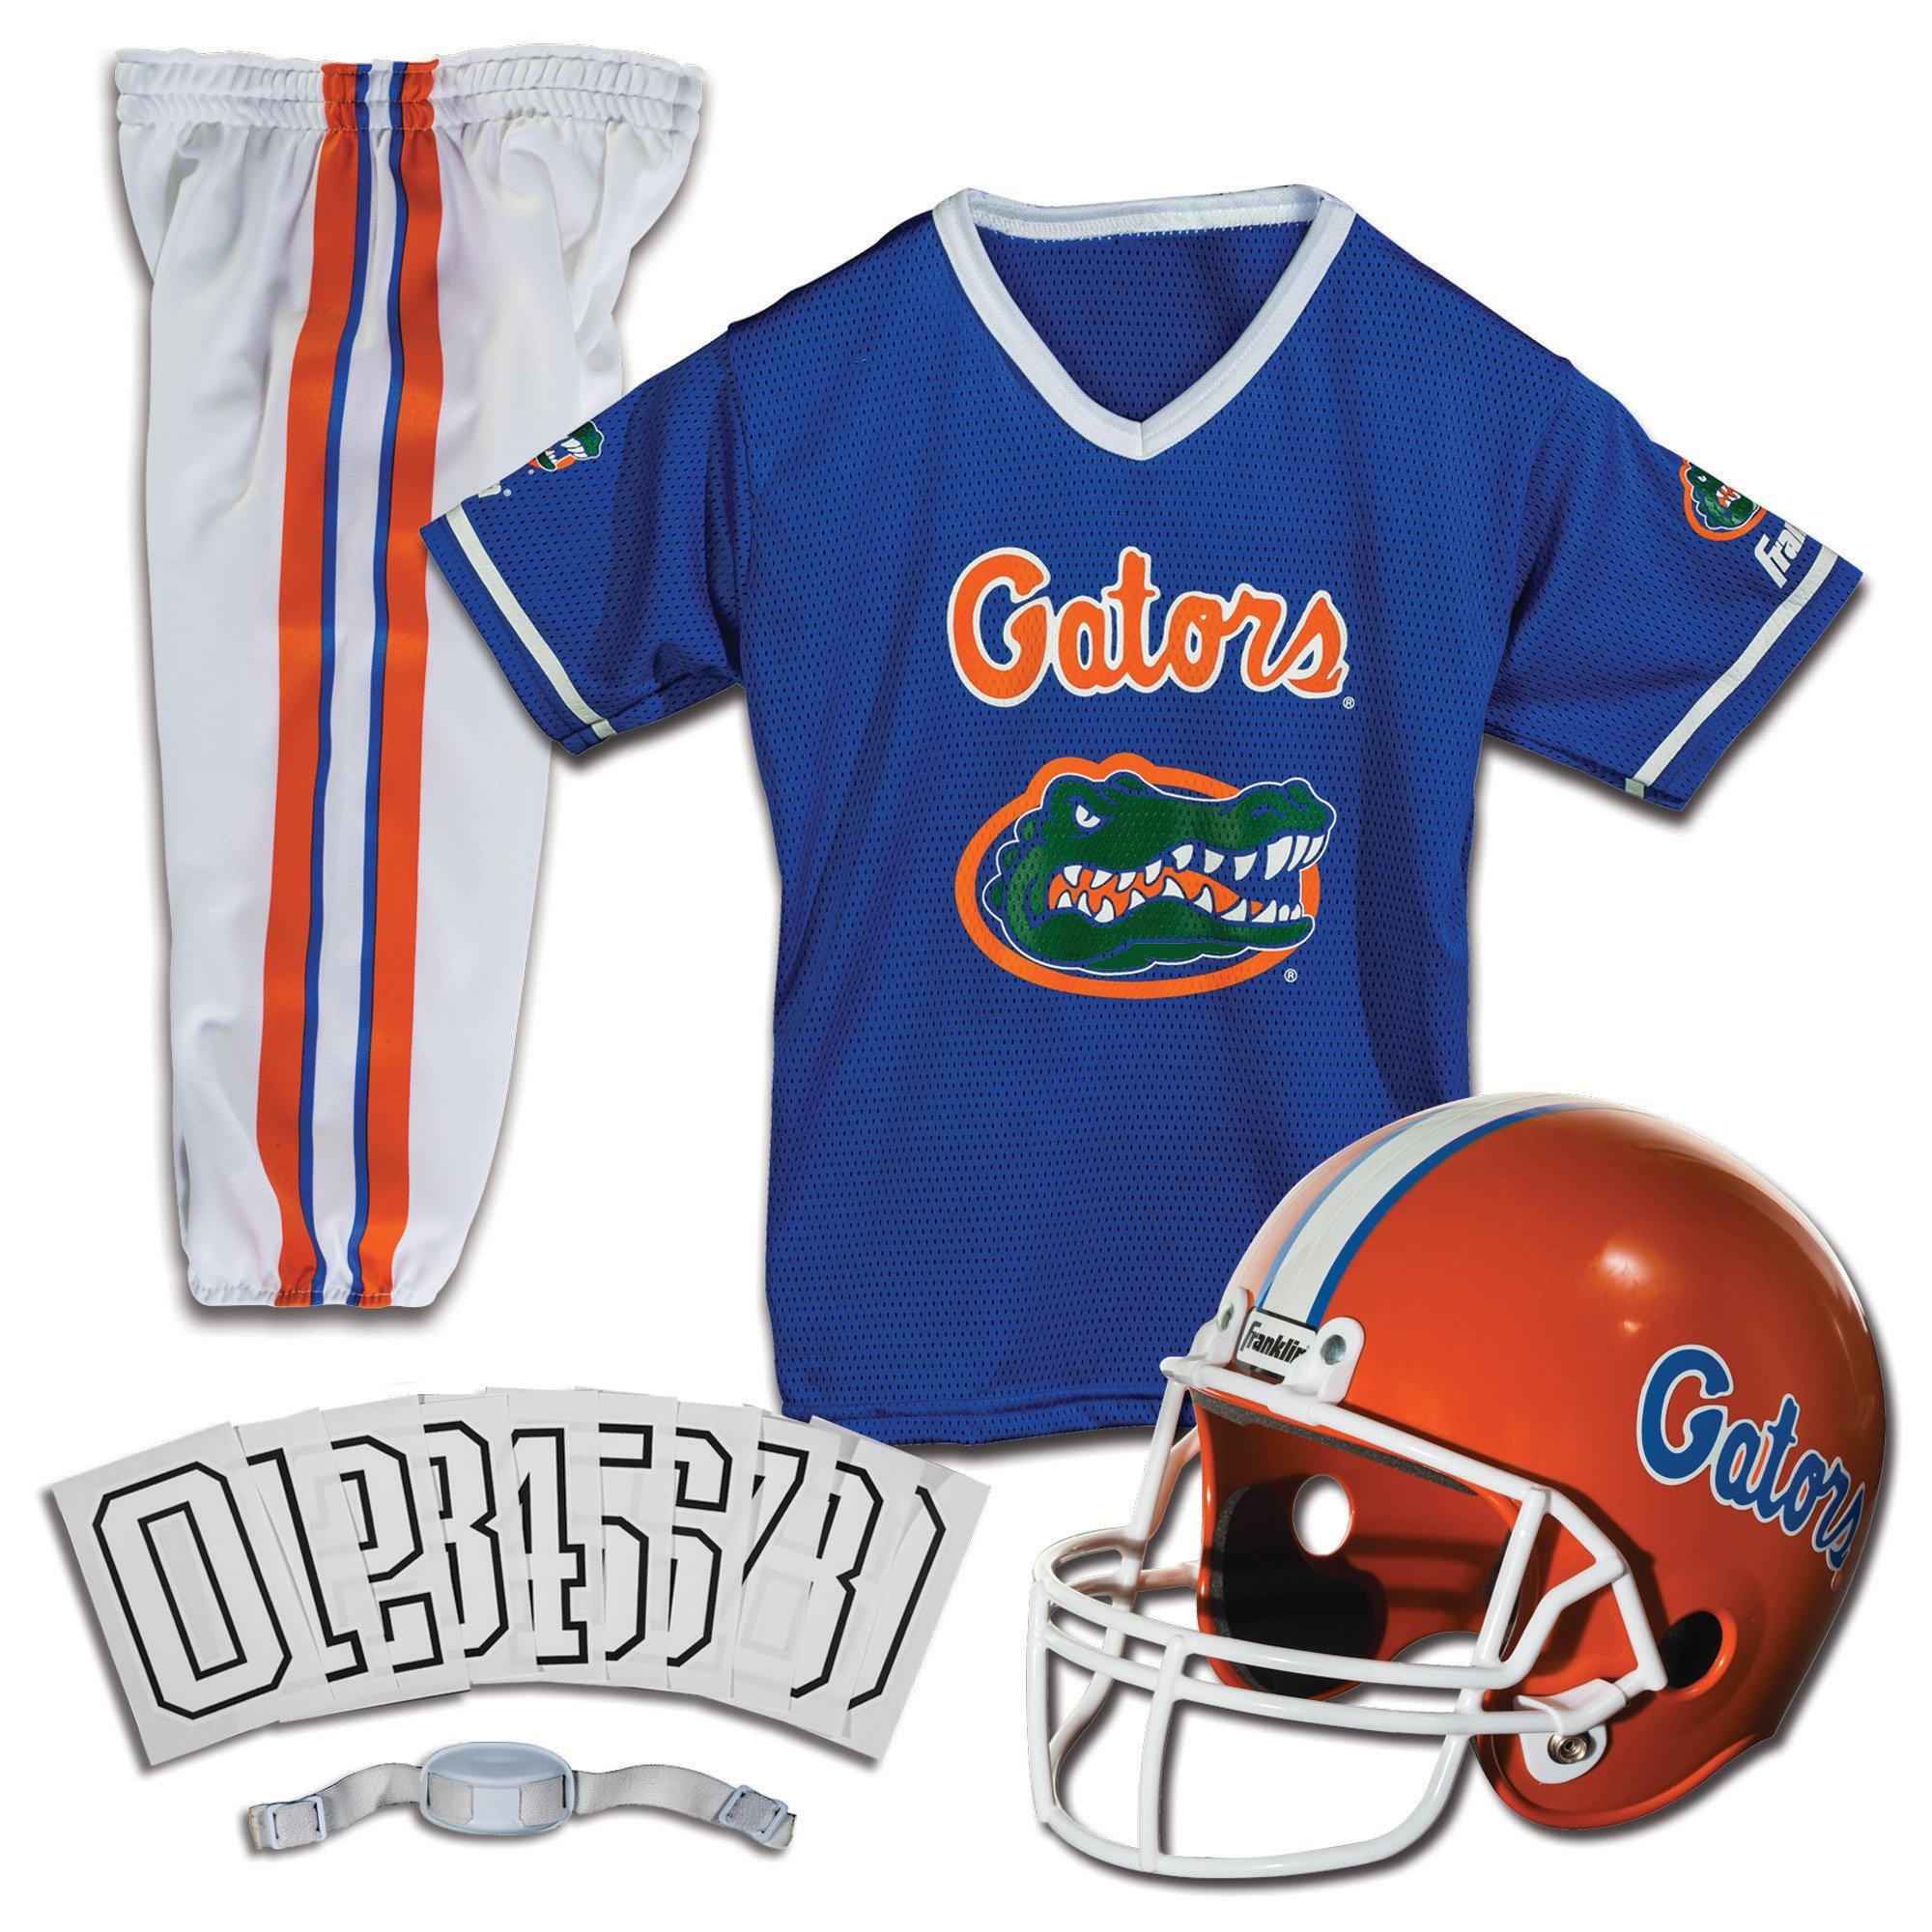 Franklin Sports NCAA Florida Gators Deluxe Youth Team Uniform Set, Medium